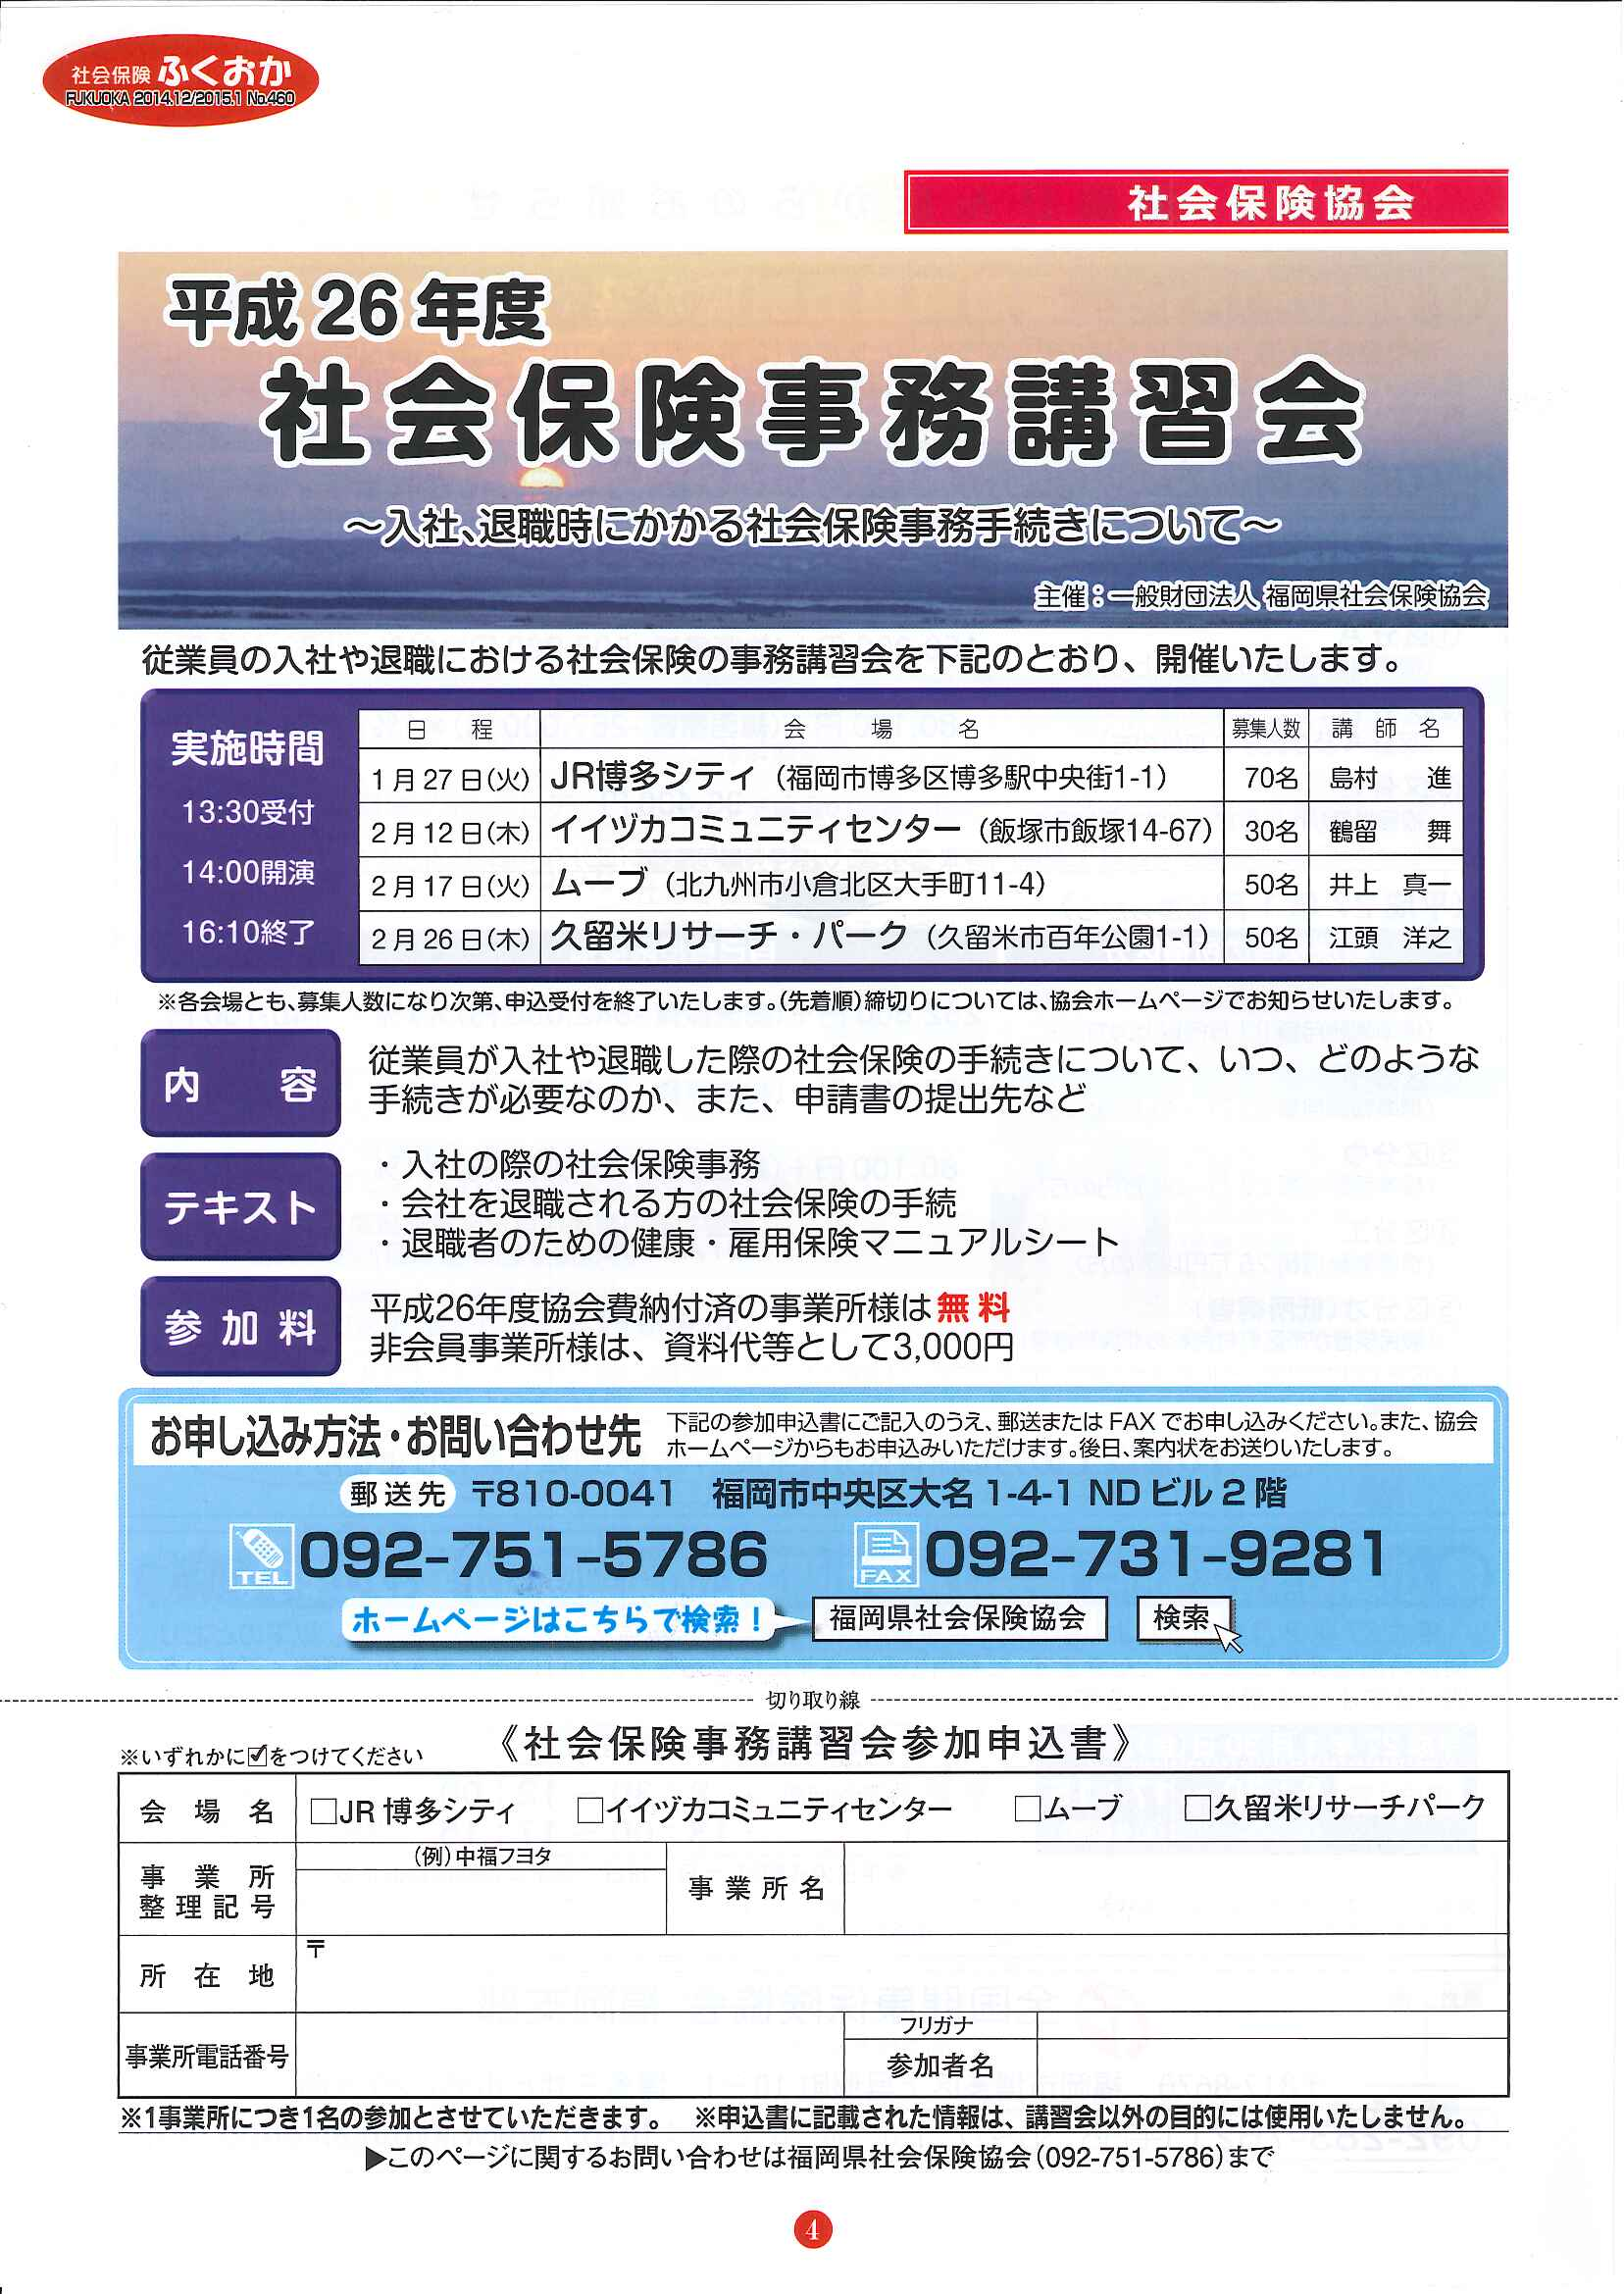 H27年1月予定/社会保険「ふくおか」/年末年始事務局休み_f0120774_1261951.jpg